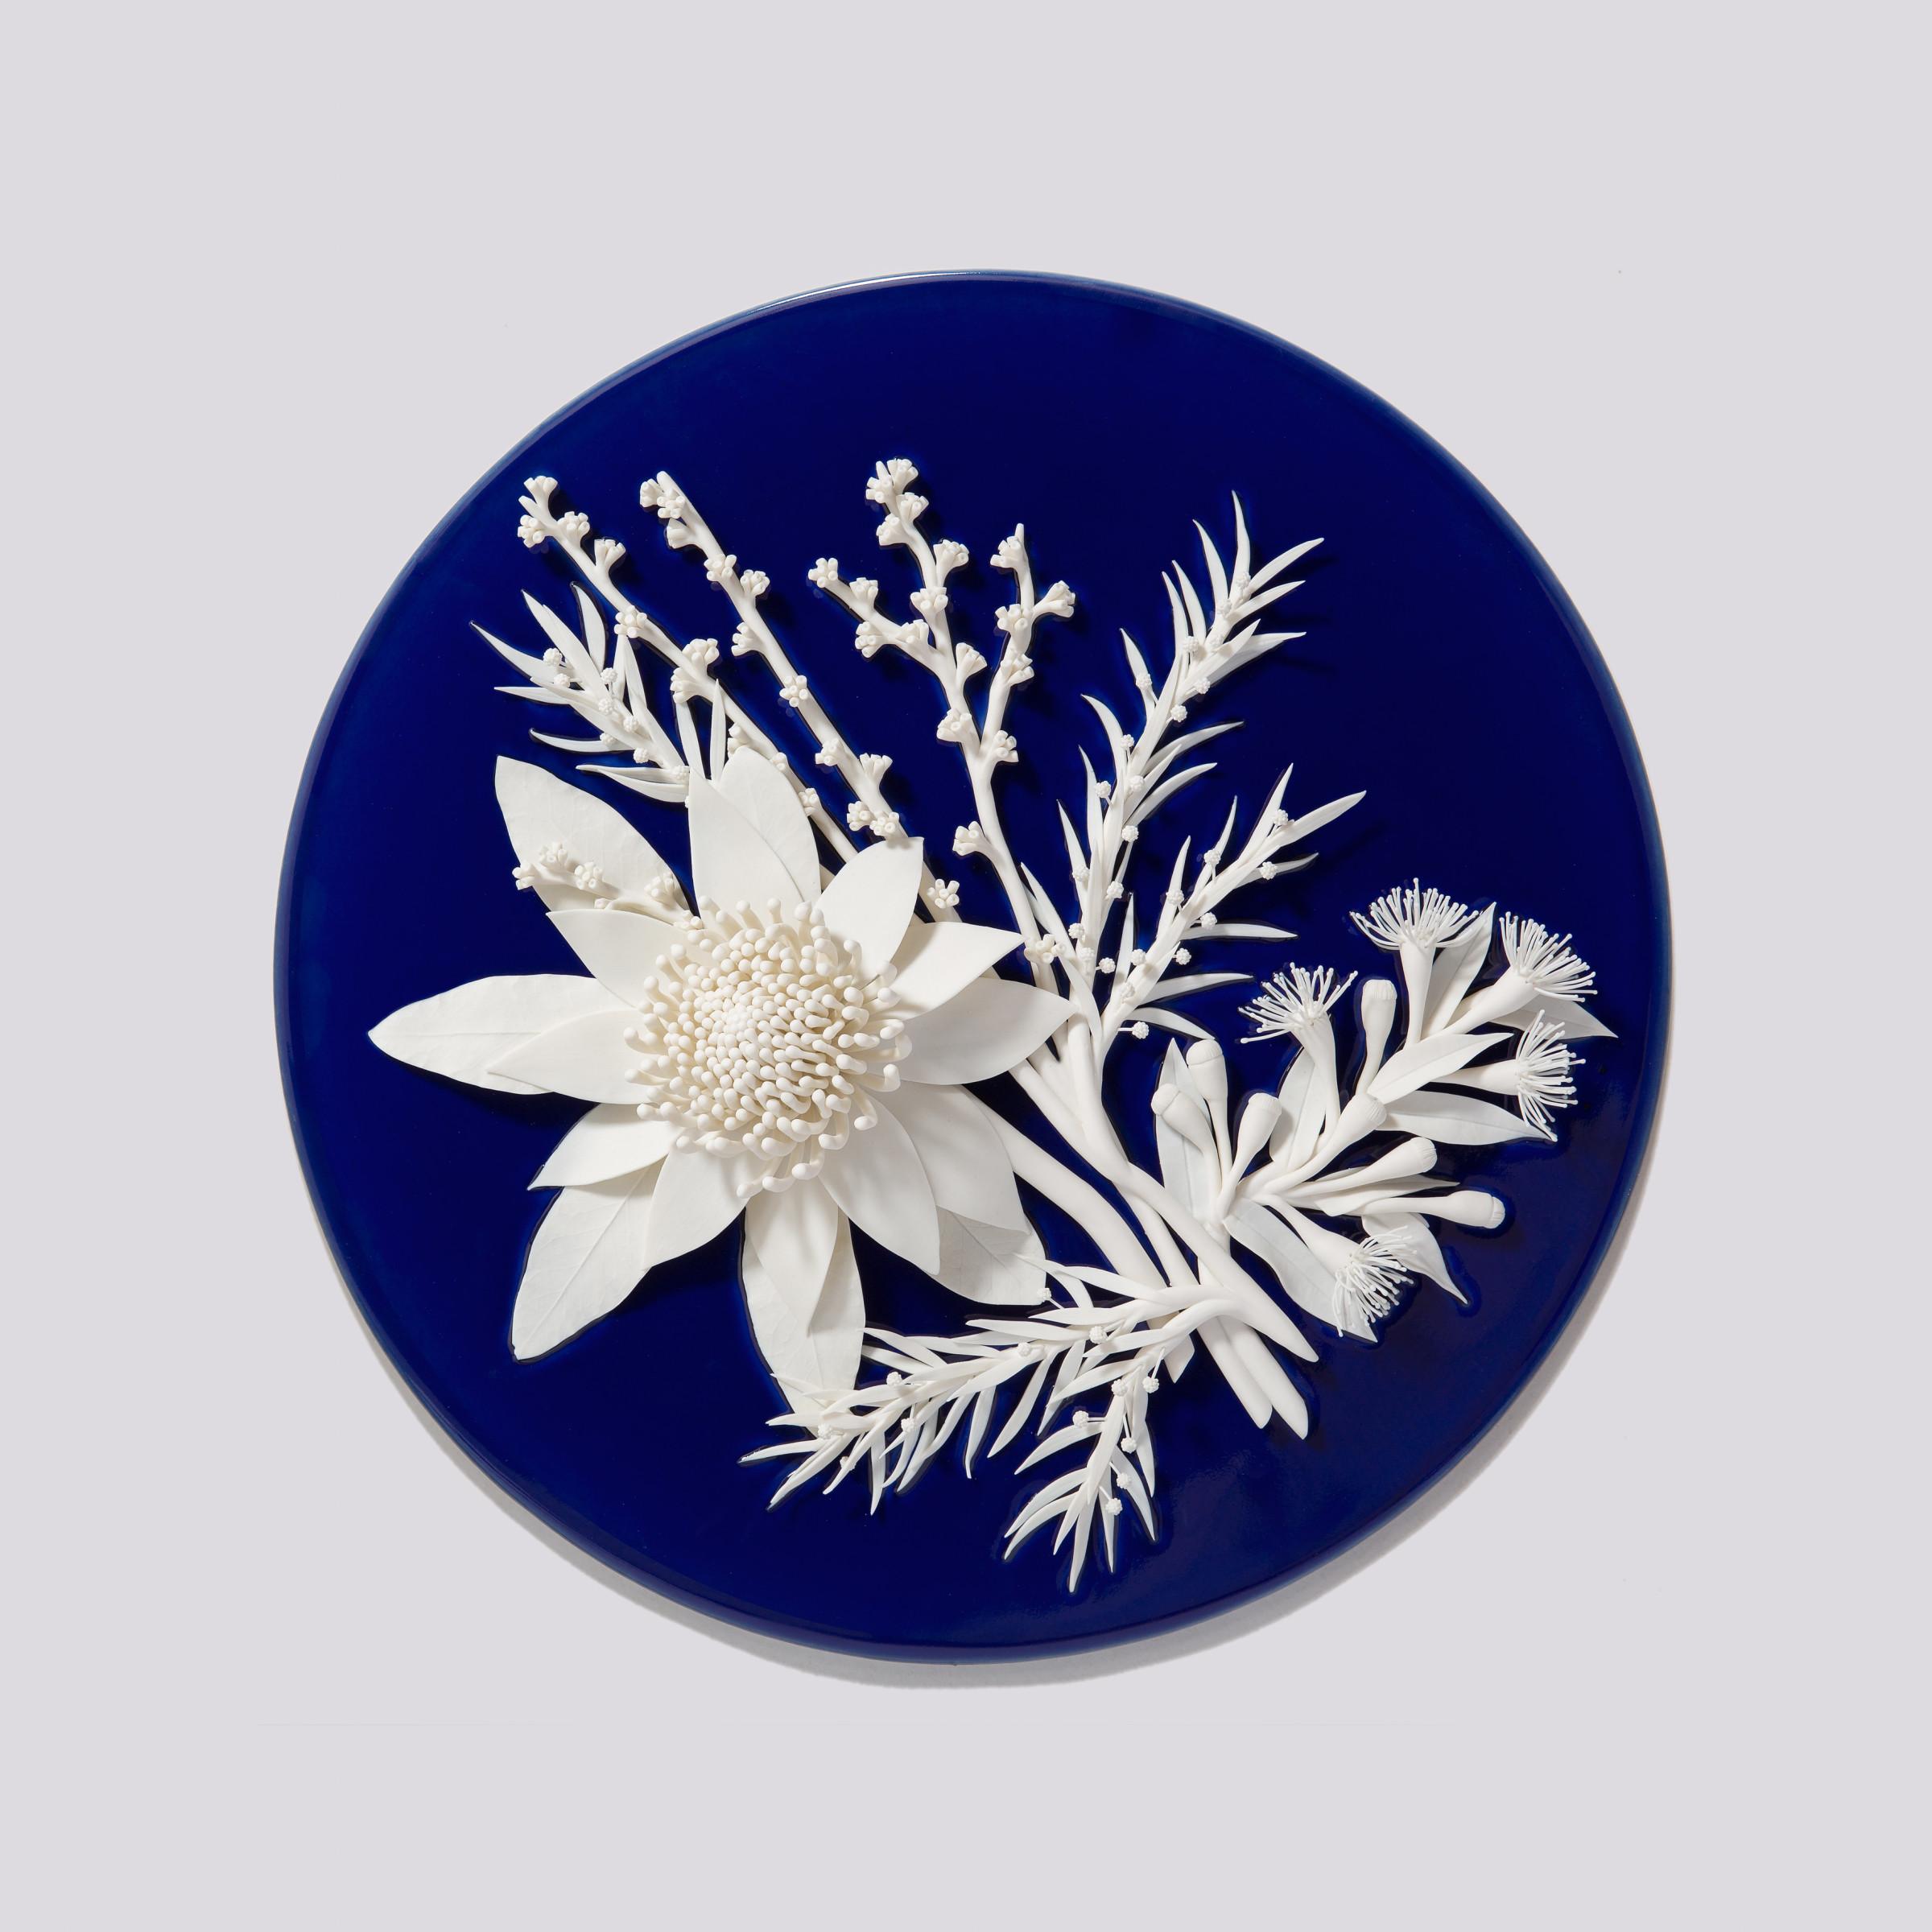 "<span class=""link fancybox-details-link""><a href=""/exhibitions/12/works/artworks2151/"">View Detail Page</a></span><div class=""artist""><strong>Alice Couttoupes</strong></div><div class=""title""><em>My Blue China, My Blue Flowers #18</em>, 2018</div><div class=""medium"">Porcelain, cobalt glaze</div><div class=""dimensions"">40 cm diameter x 10 cm</div>"